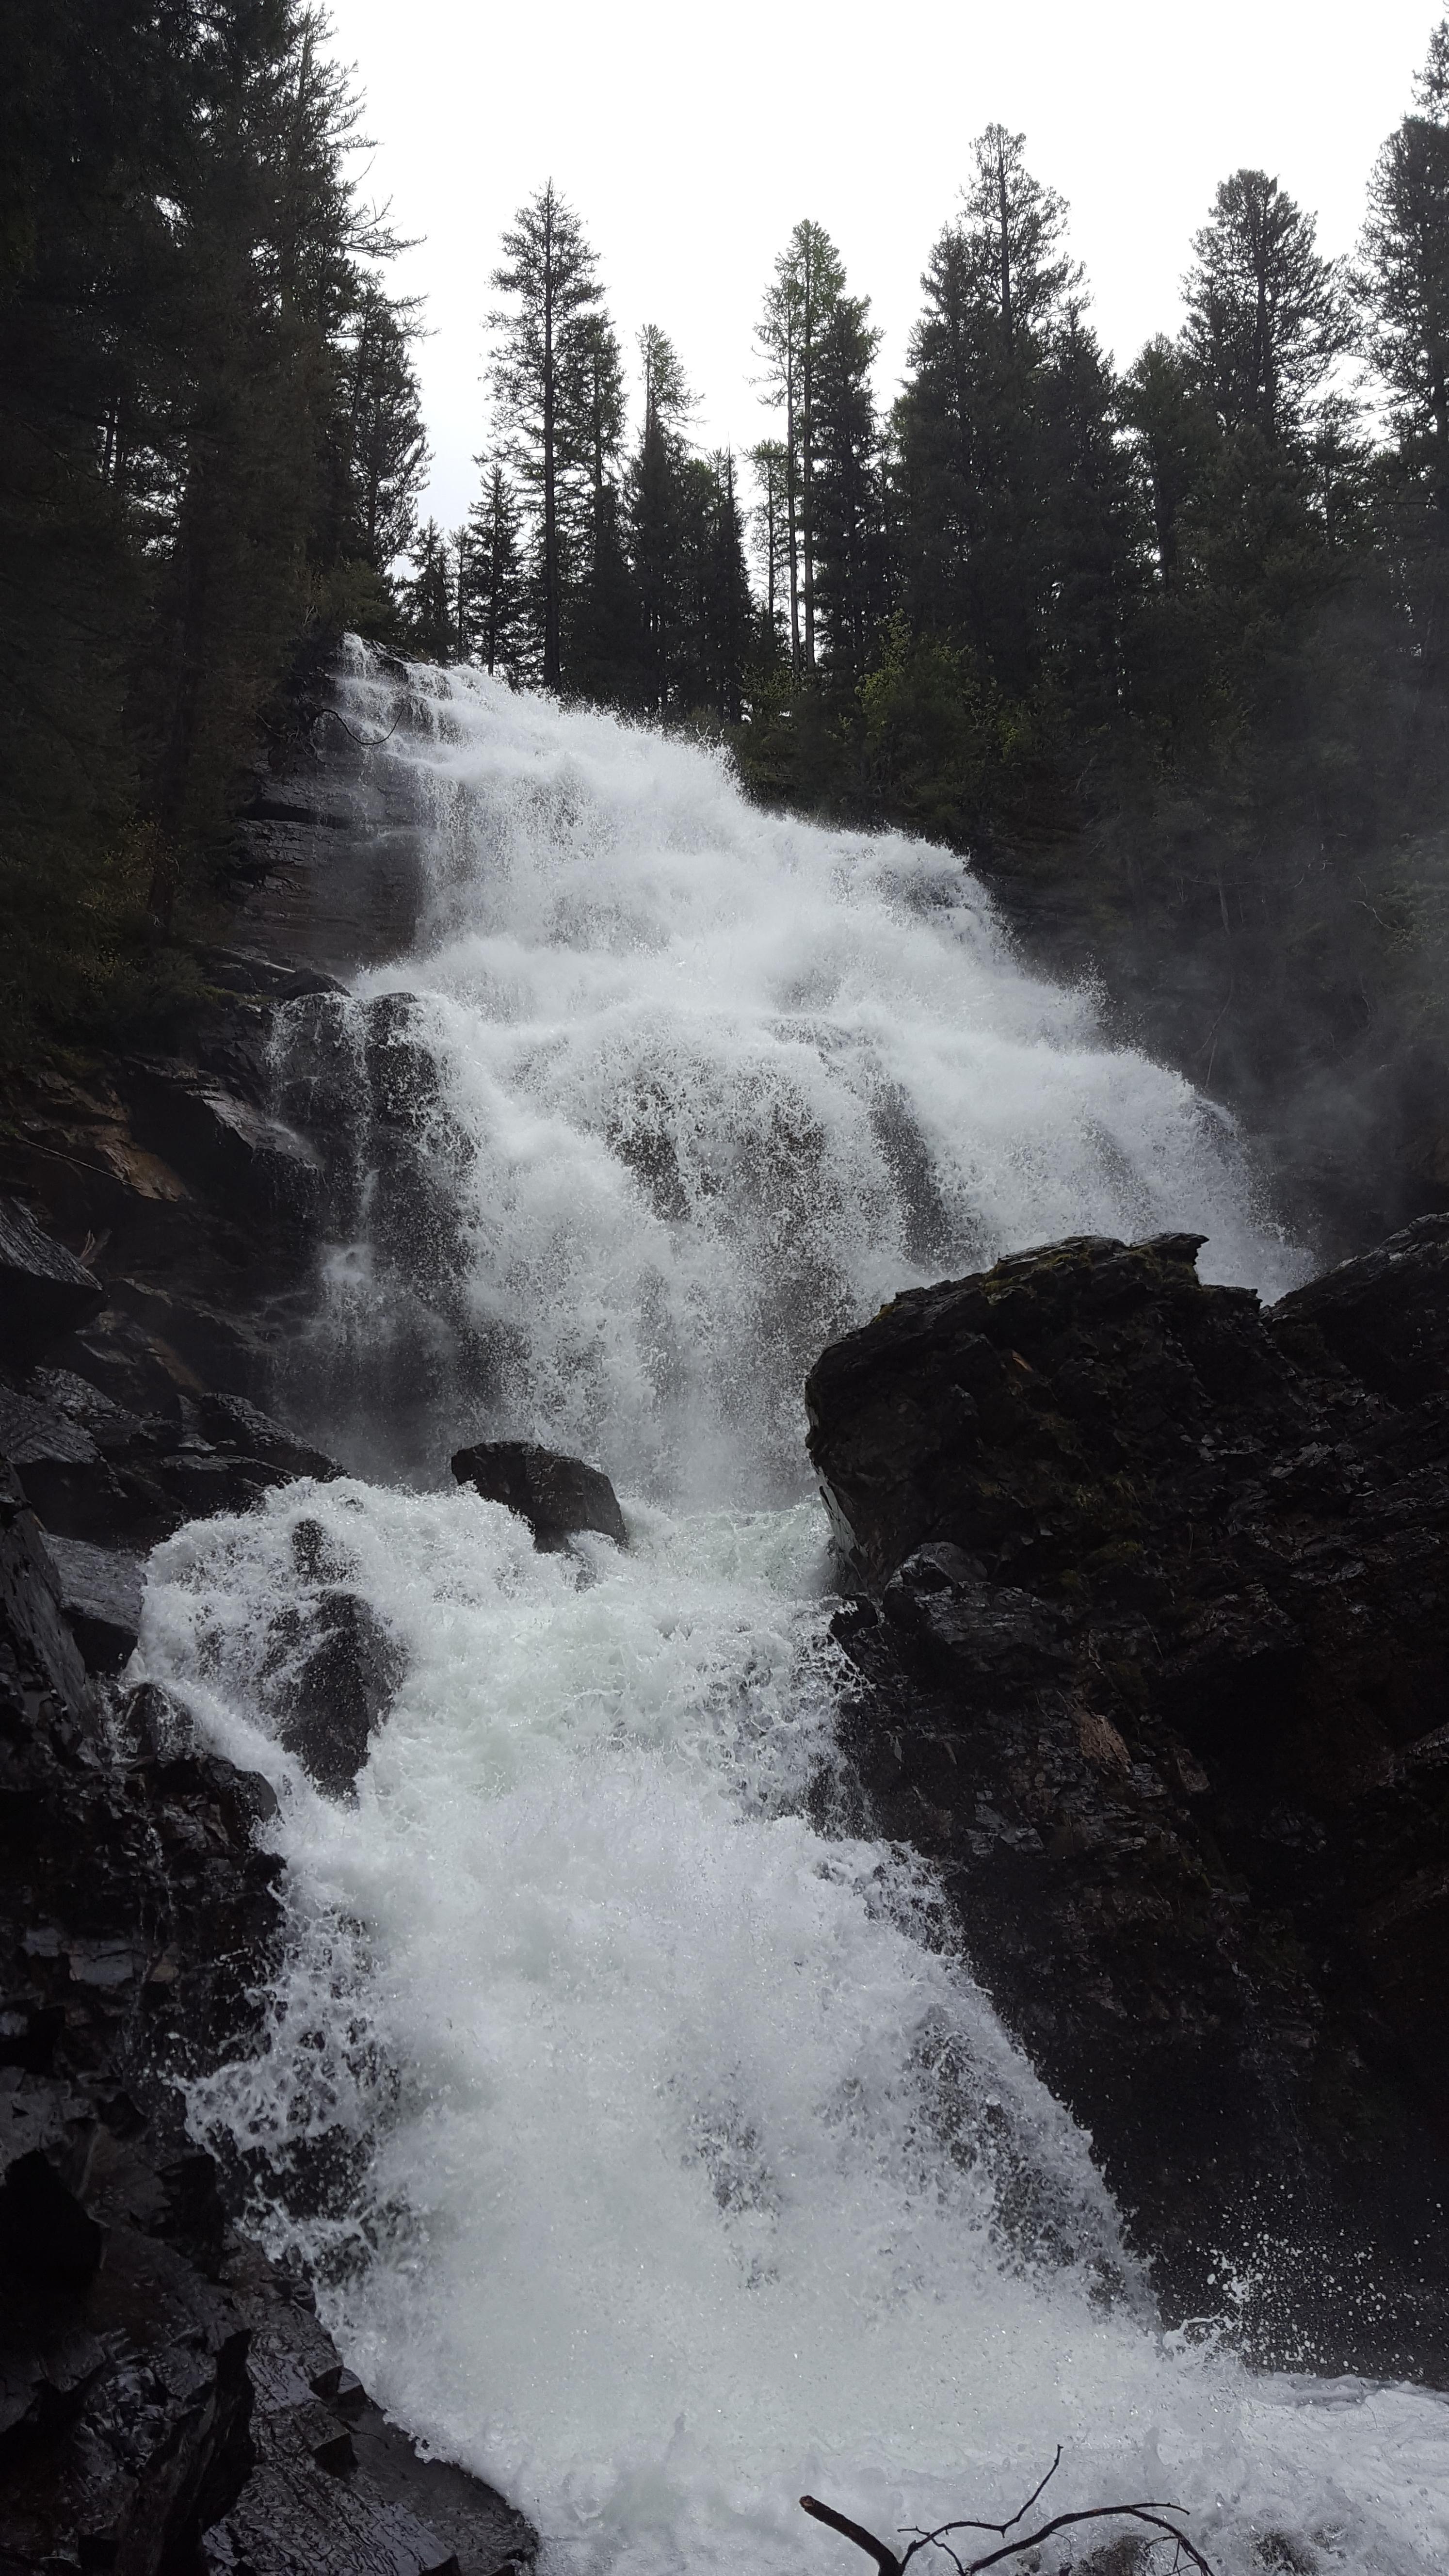 Best 25 seeley lake mt ideas only on pinterest seeley lake seeley lake montana and waterfalls